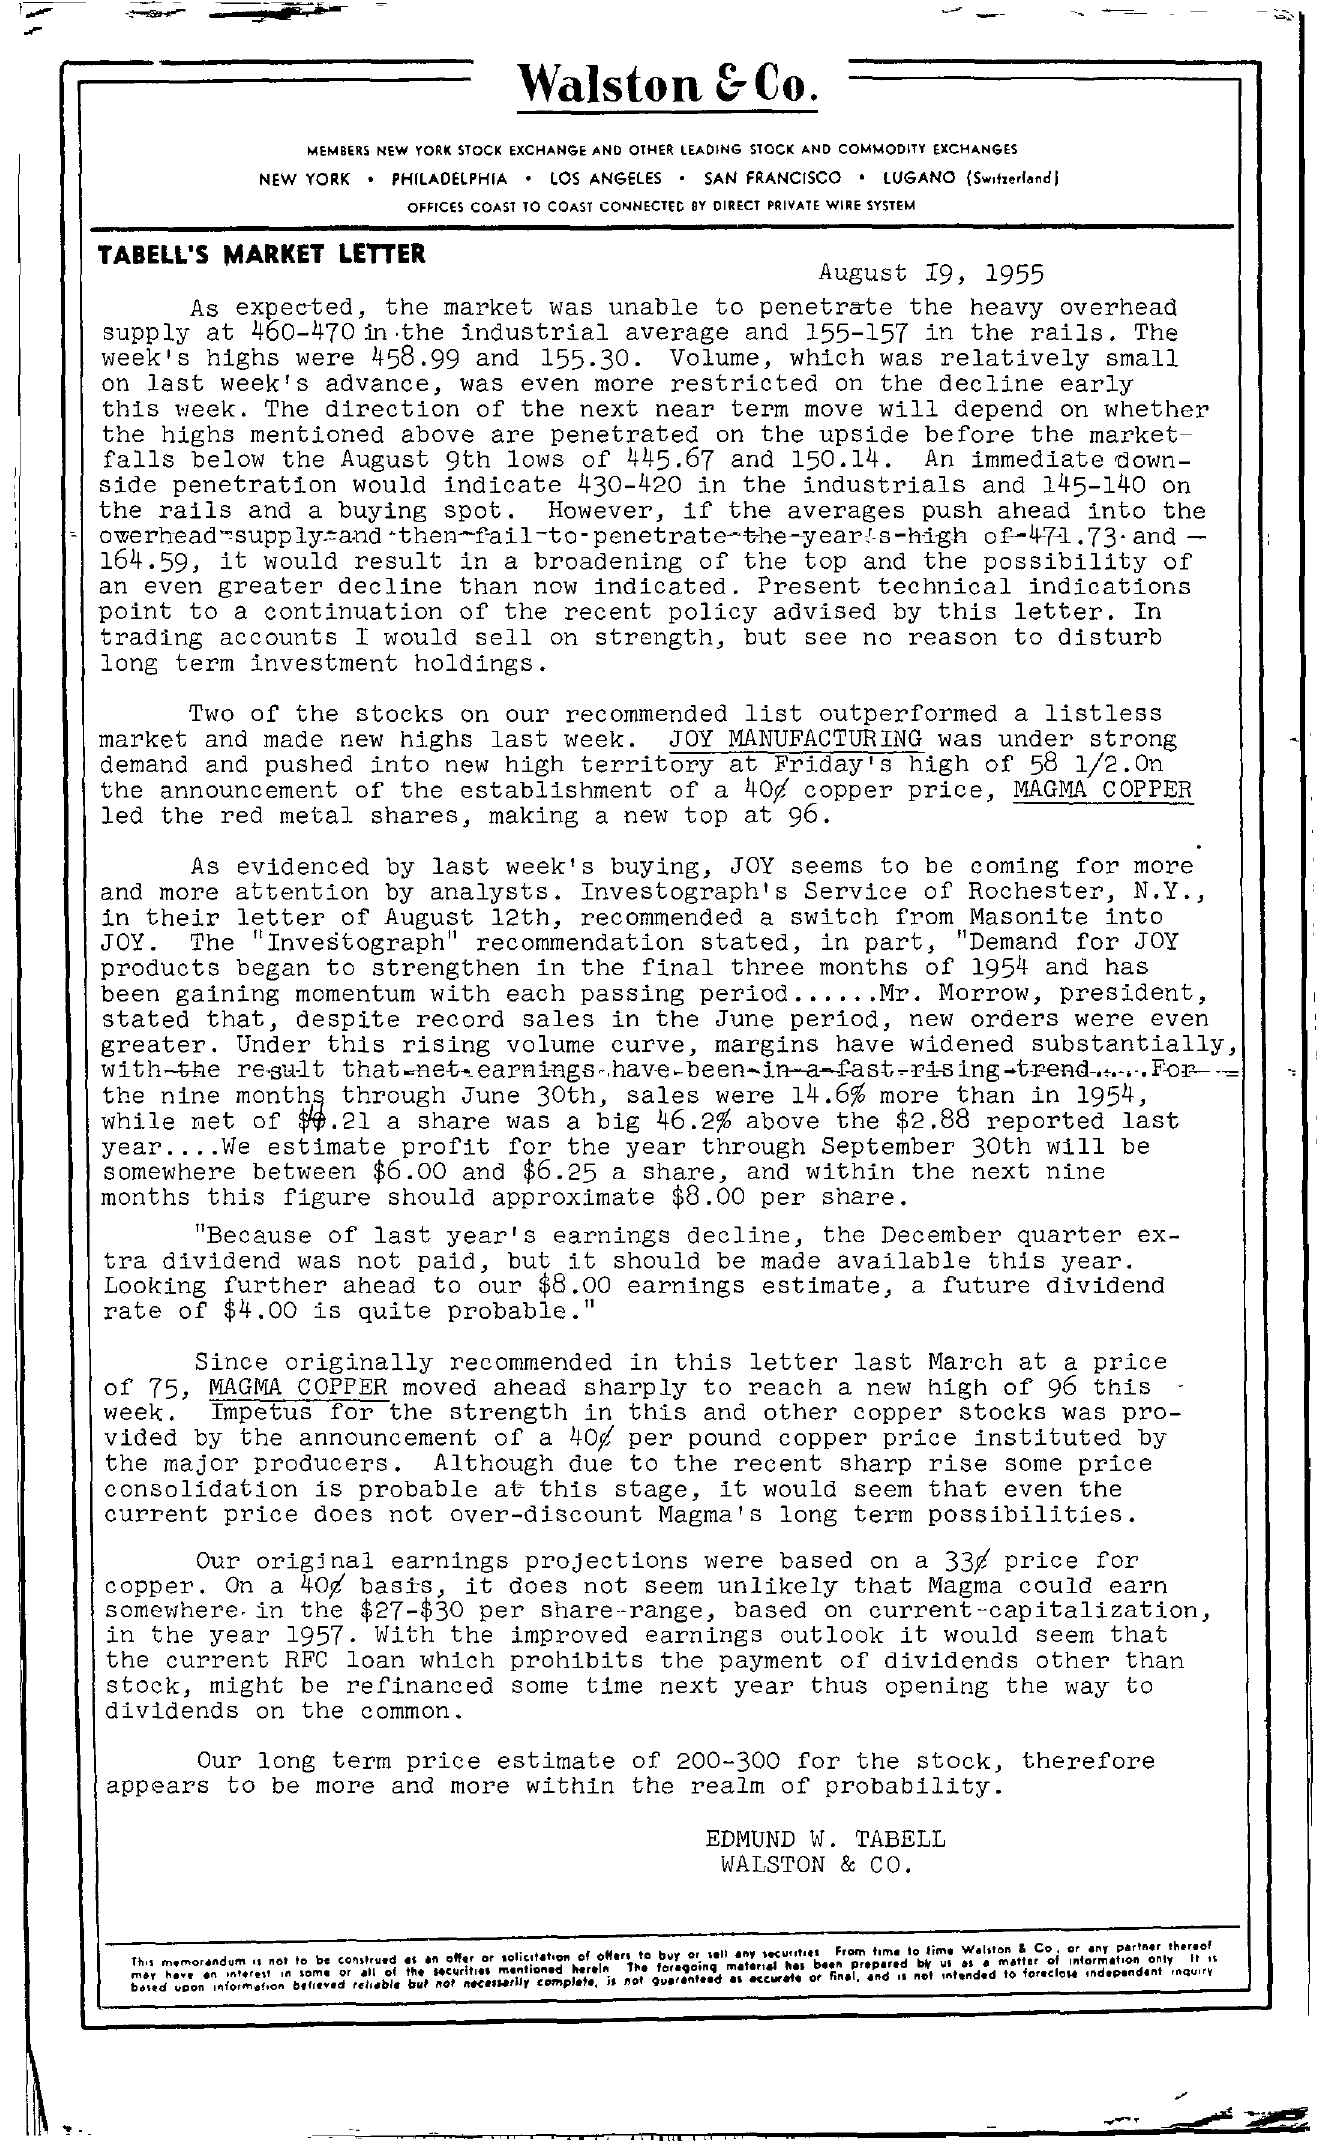 Tabell's Market Letter - August 19, 1955